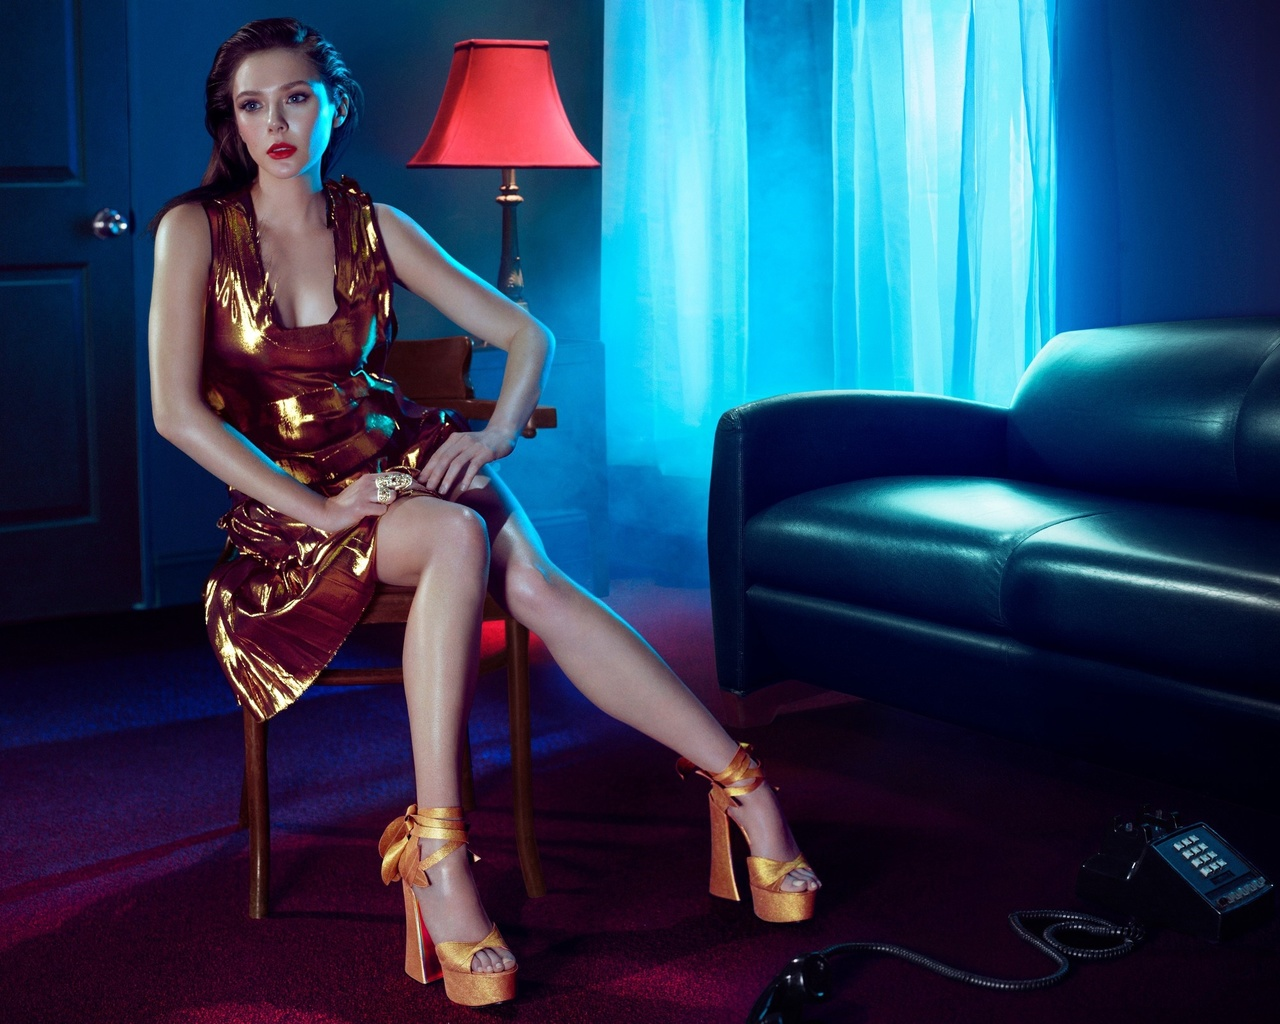 curtains, phone, shoes, makeup, beauty, legs, actress, posing, light, window, elizabeth olsen